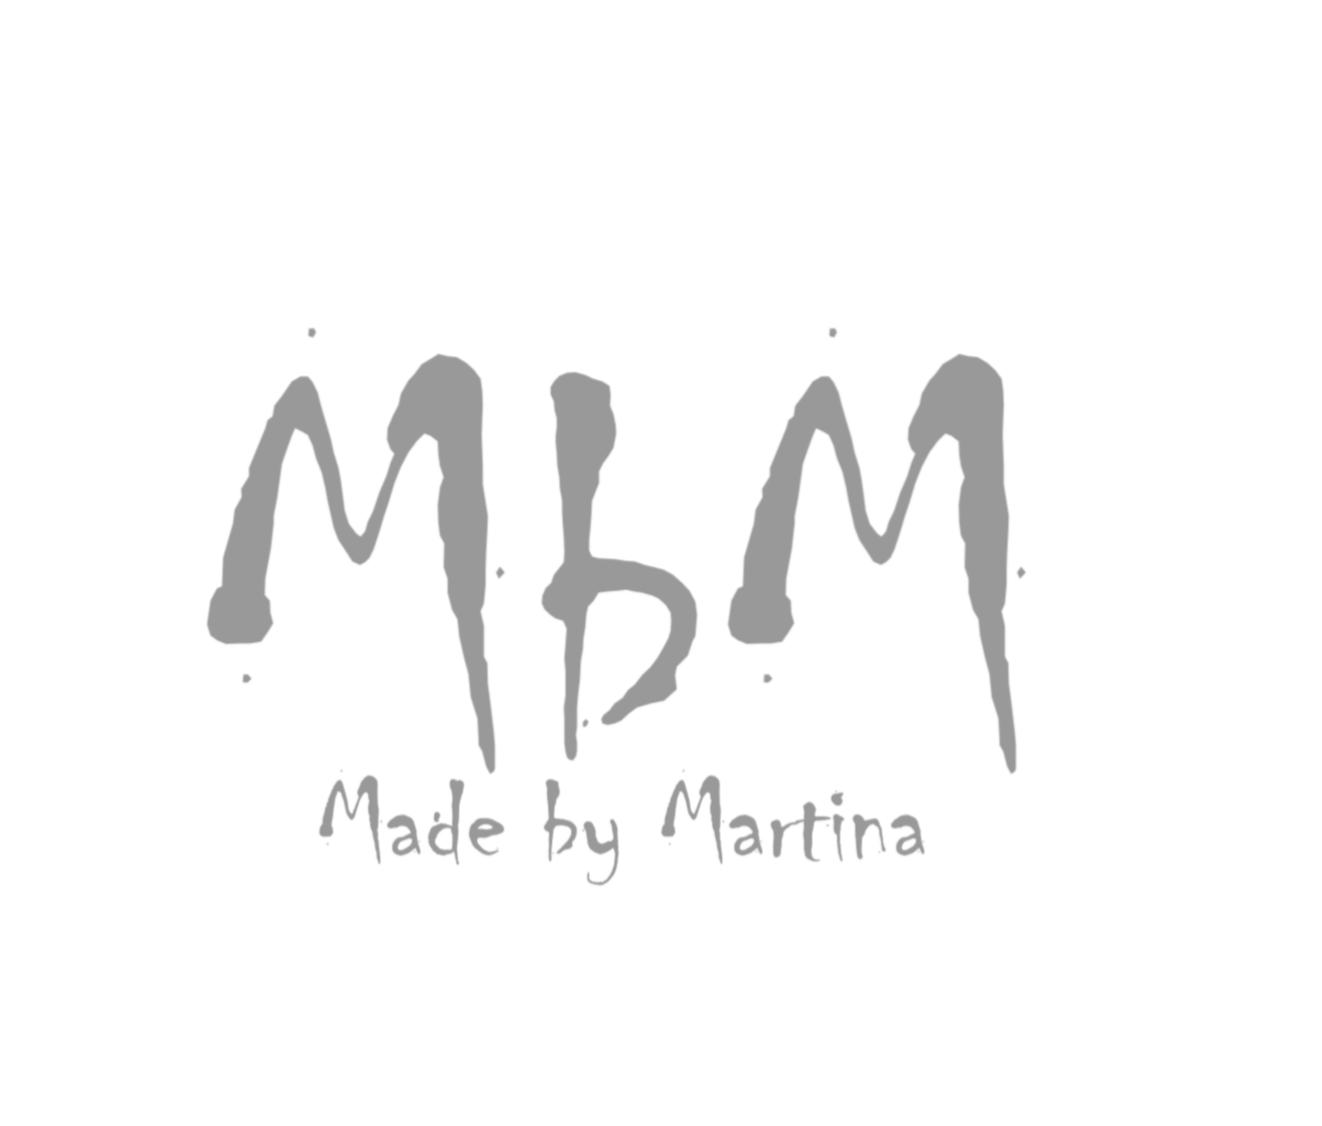 Made by Martina